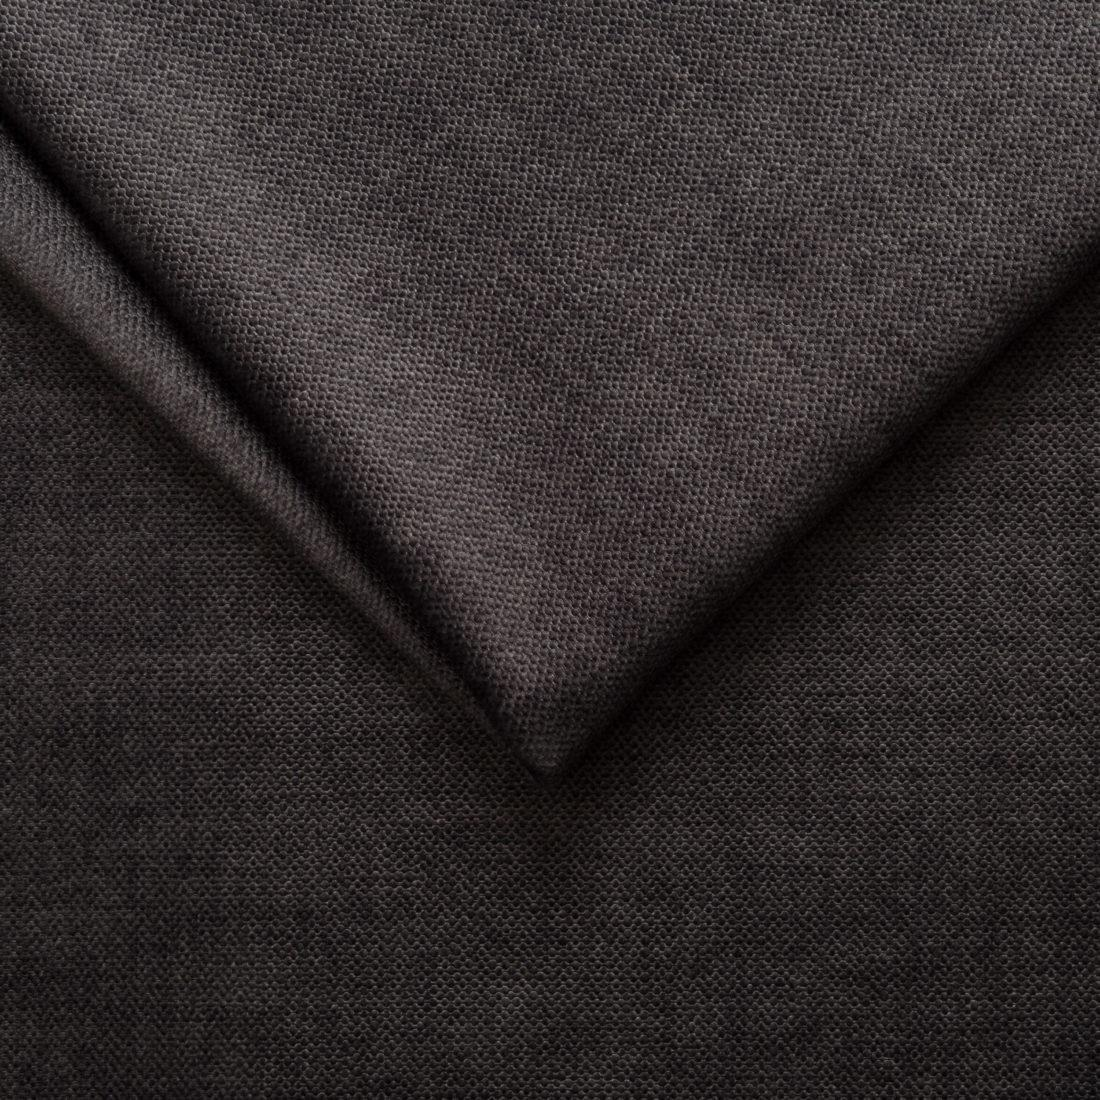 Меблева тканина Vogue 16 Graphite, велюр